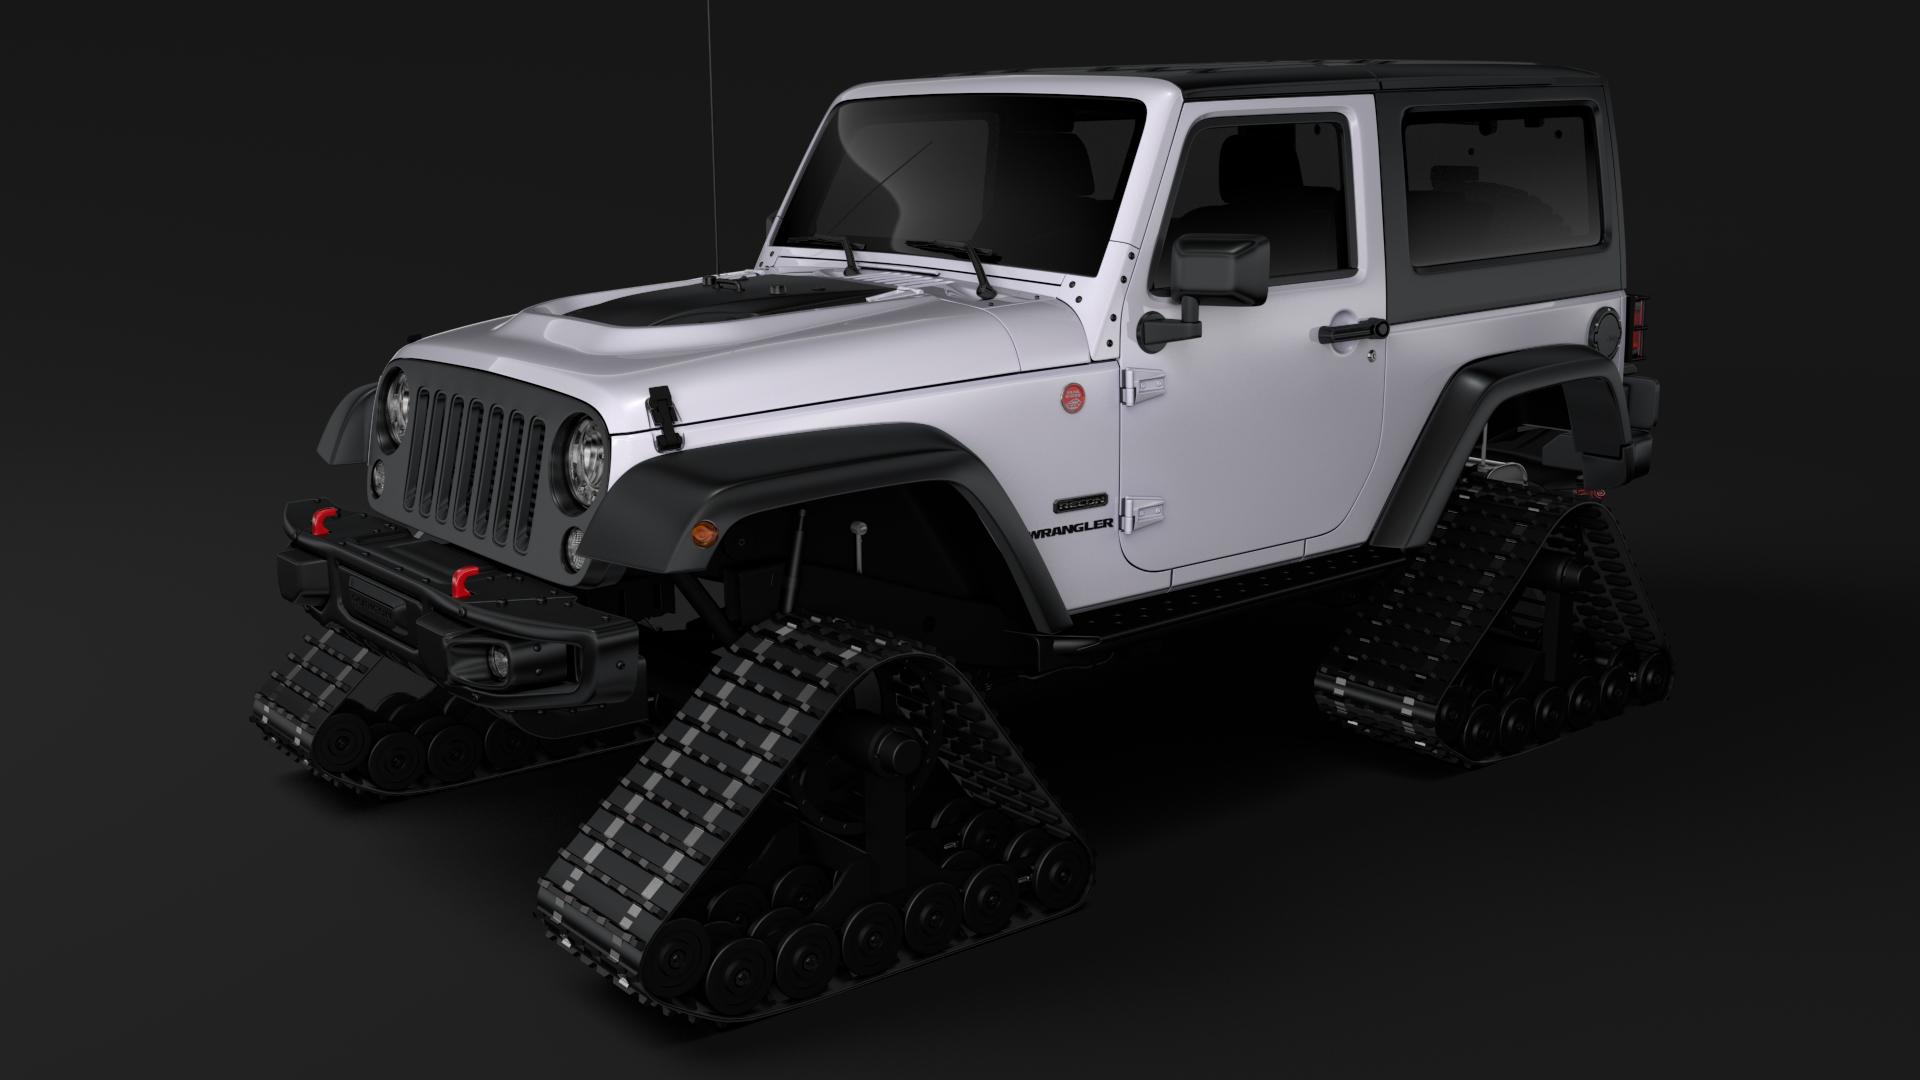 jeep wrangler crawler rubicon recon jk 2017 3d model max fbx c4d lwo ma mb hrc xsi obj 276908